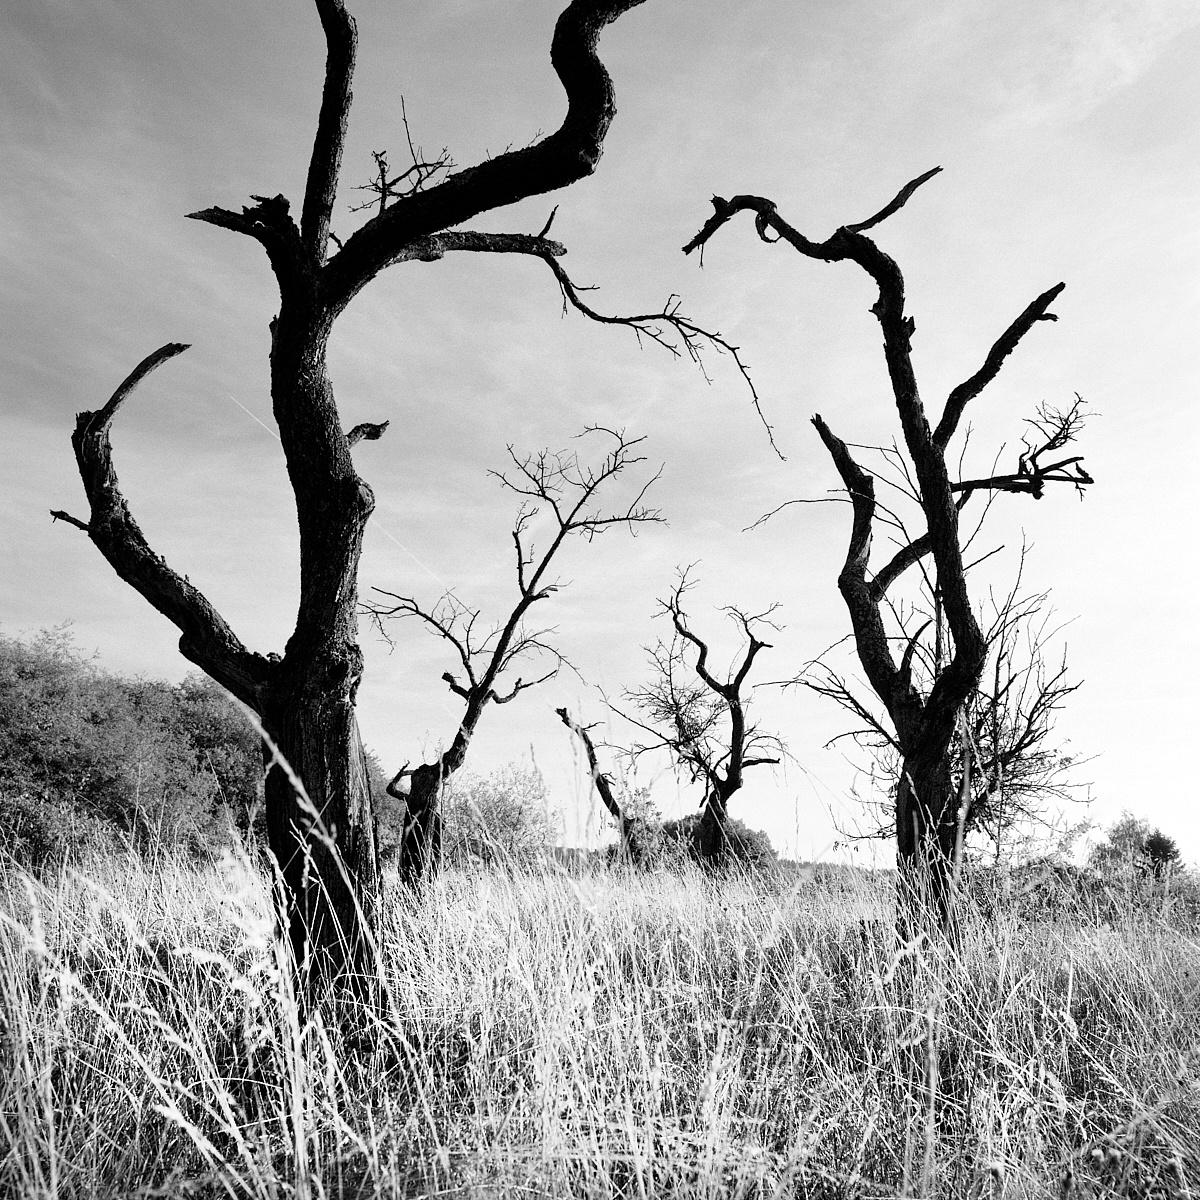 2018-10-31-2148-trees.jpg